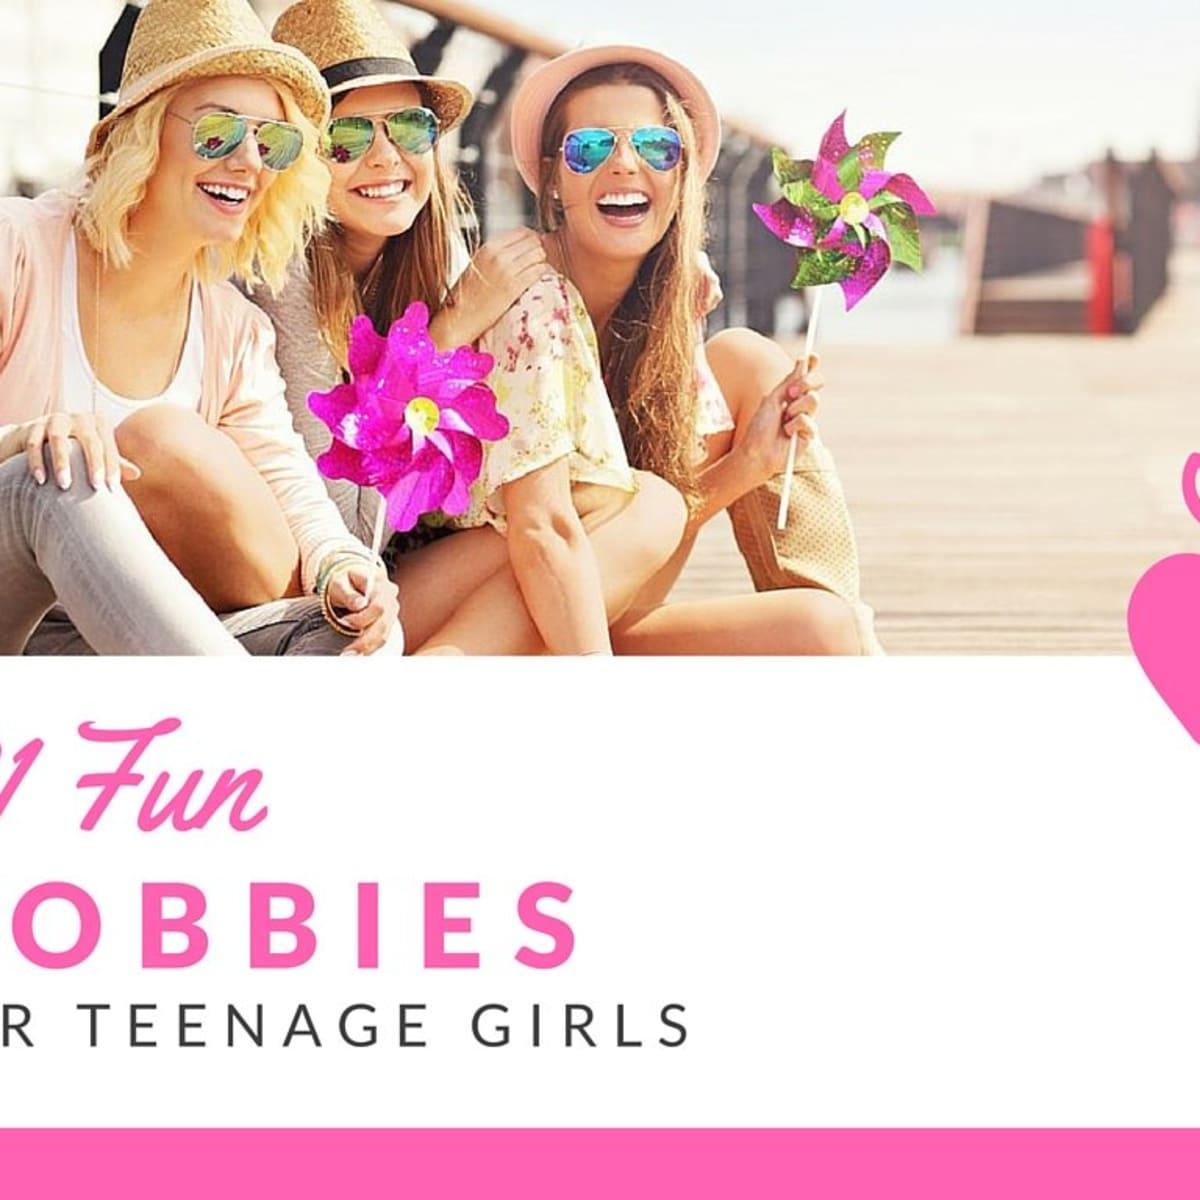 101 Fun Hobbies For Teenage Girls Wehavekids